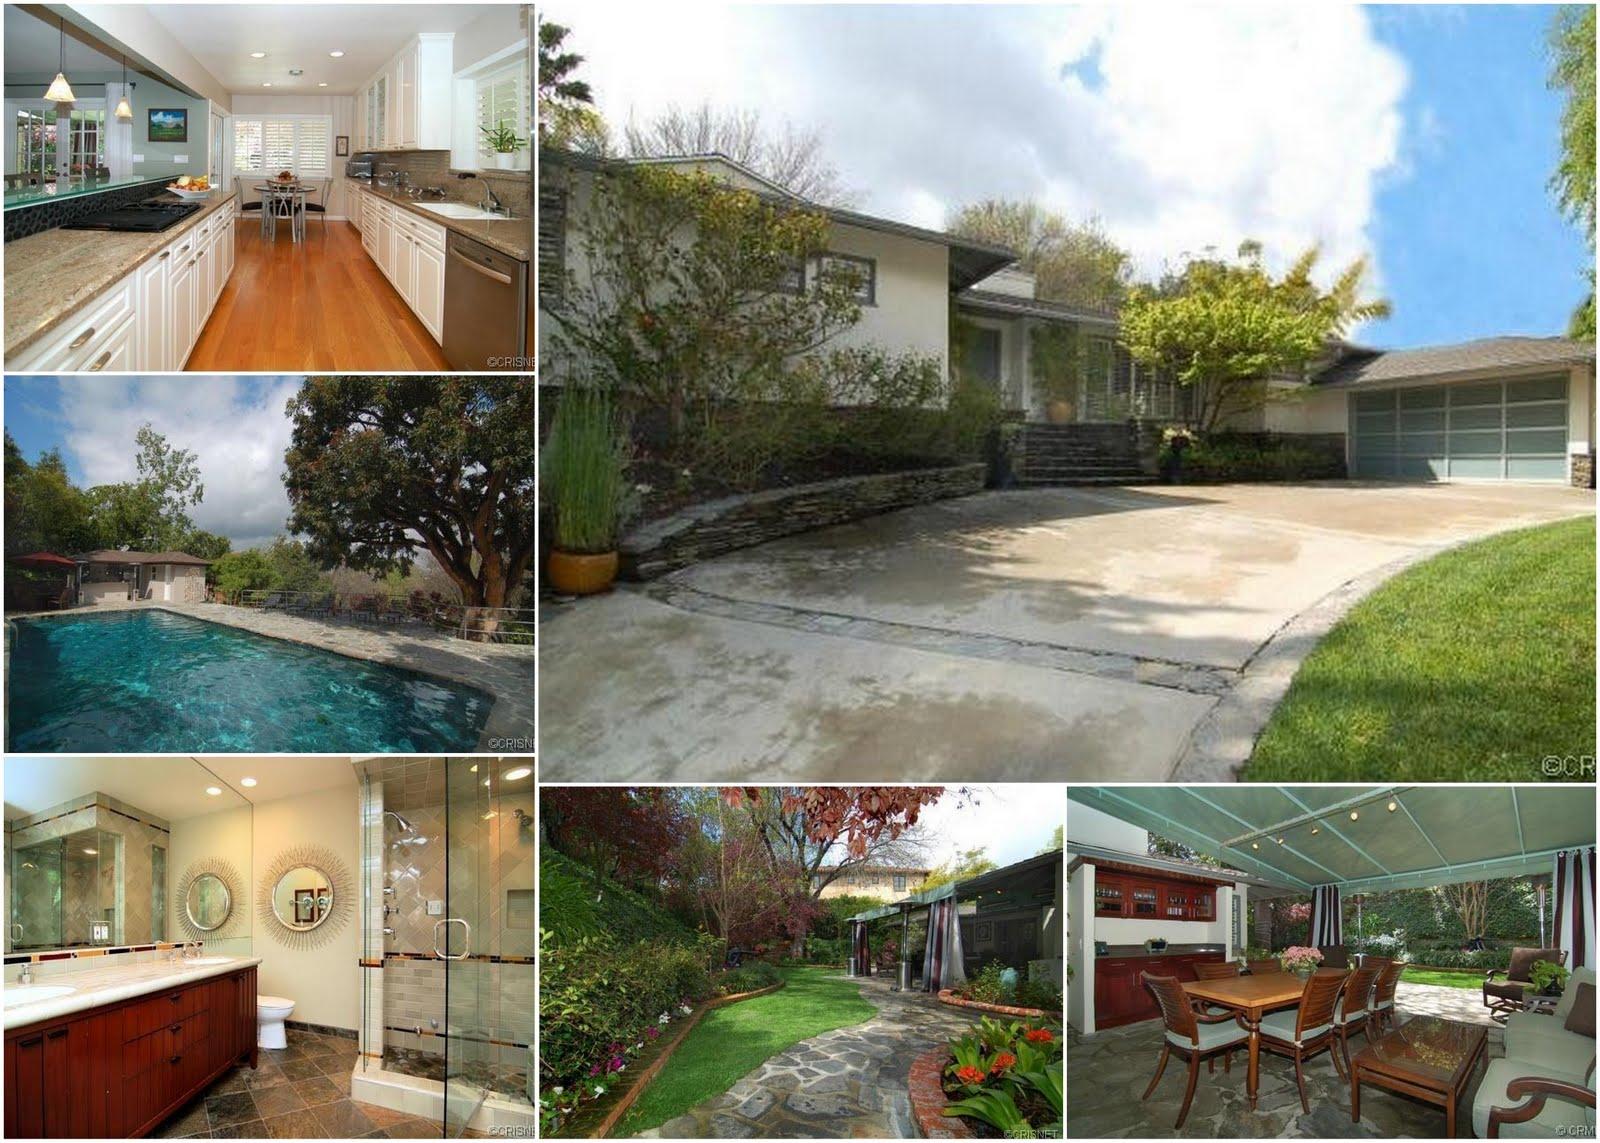 Celebrity real estate leighton meester calls encino home Celebrity real estate pictures